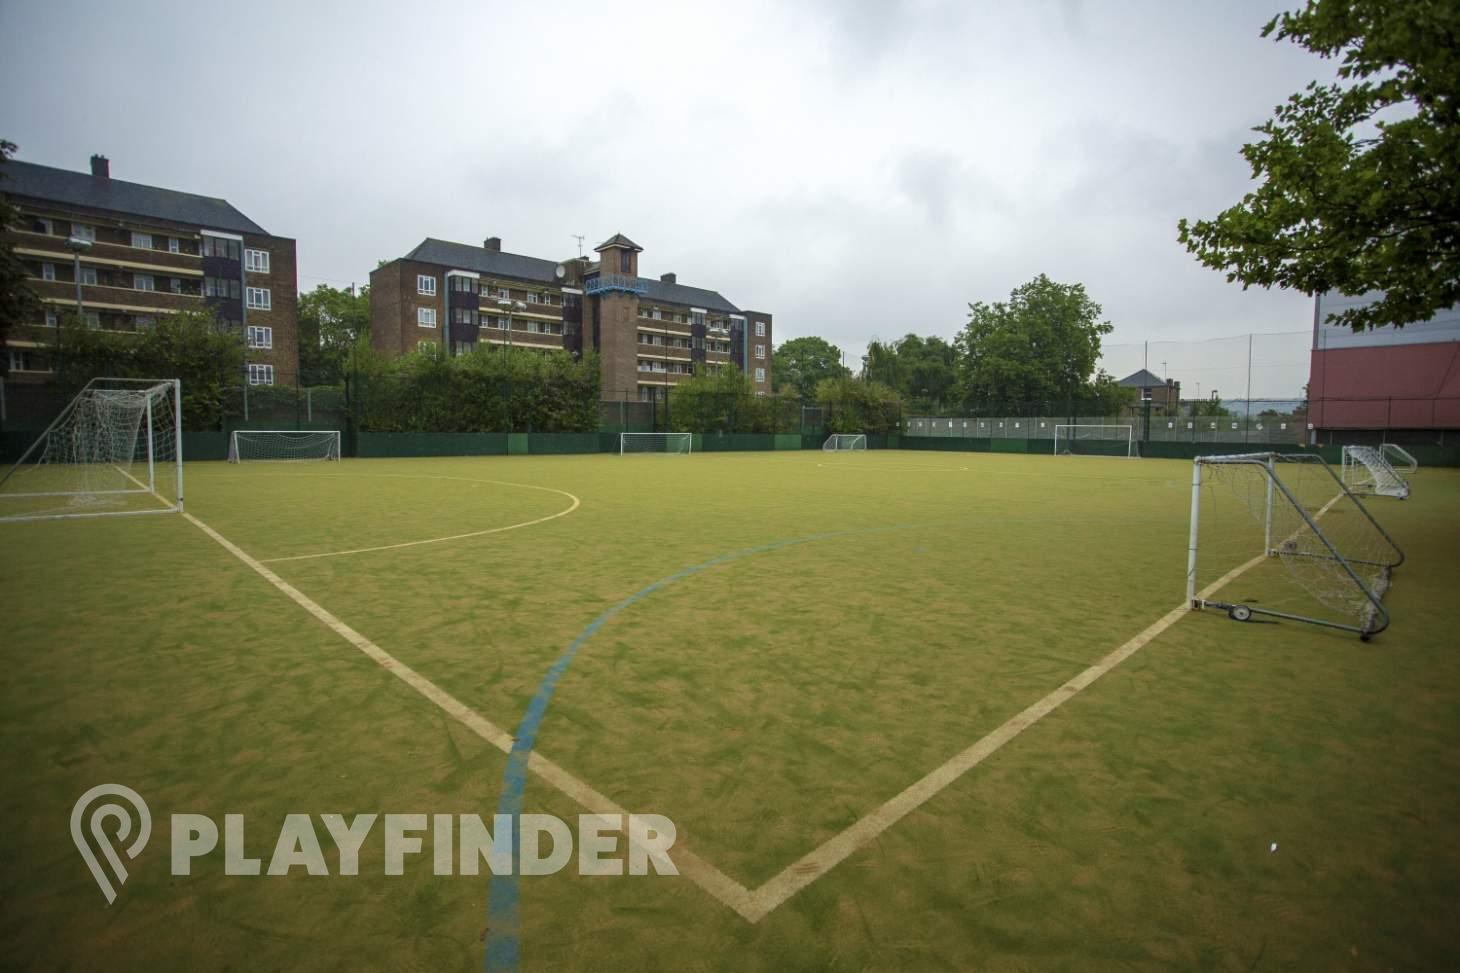 PlayFootball Holloway 5 a side | Astroturf football pitch